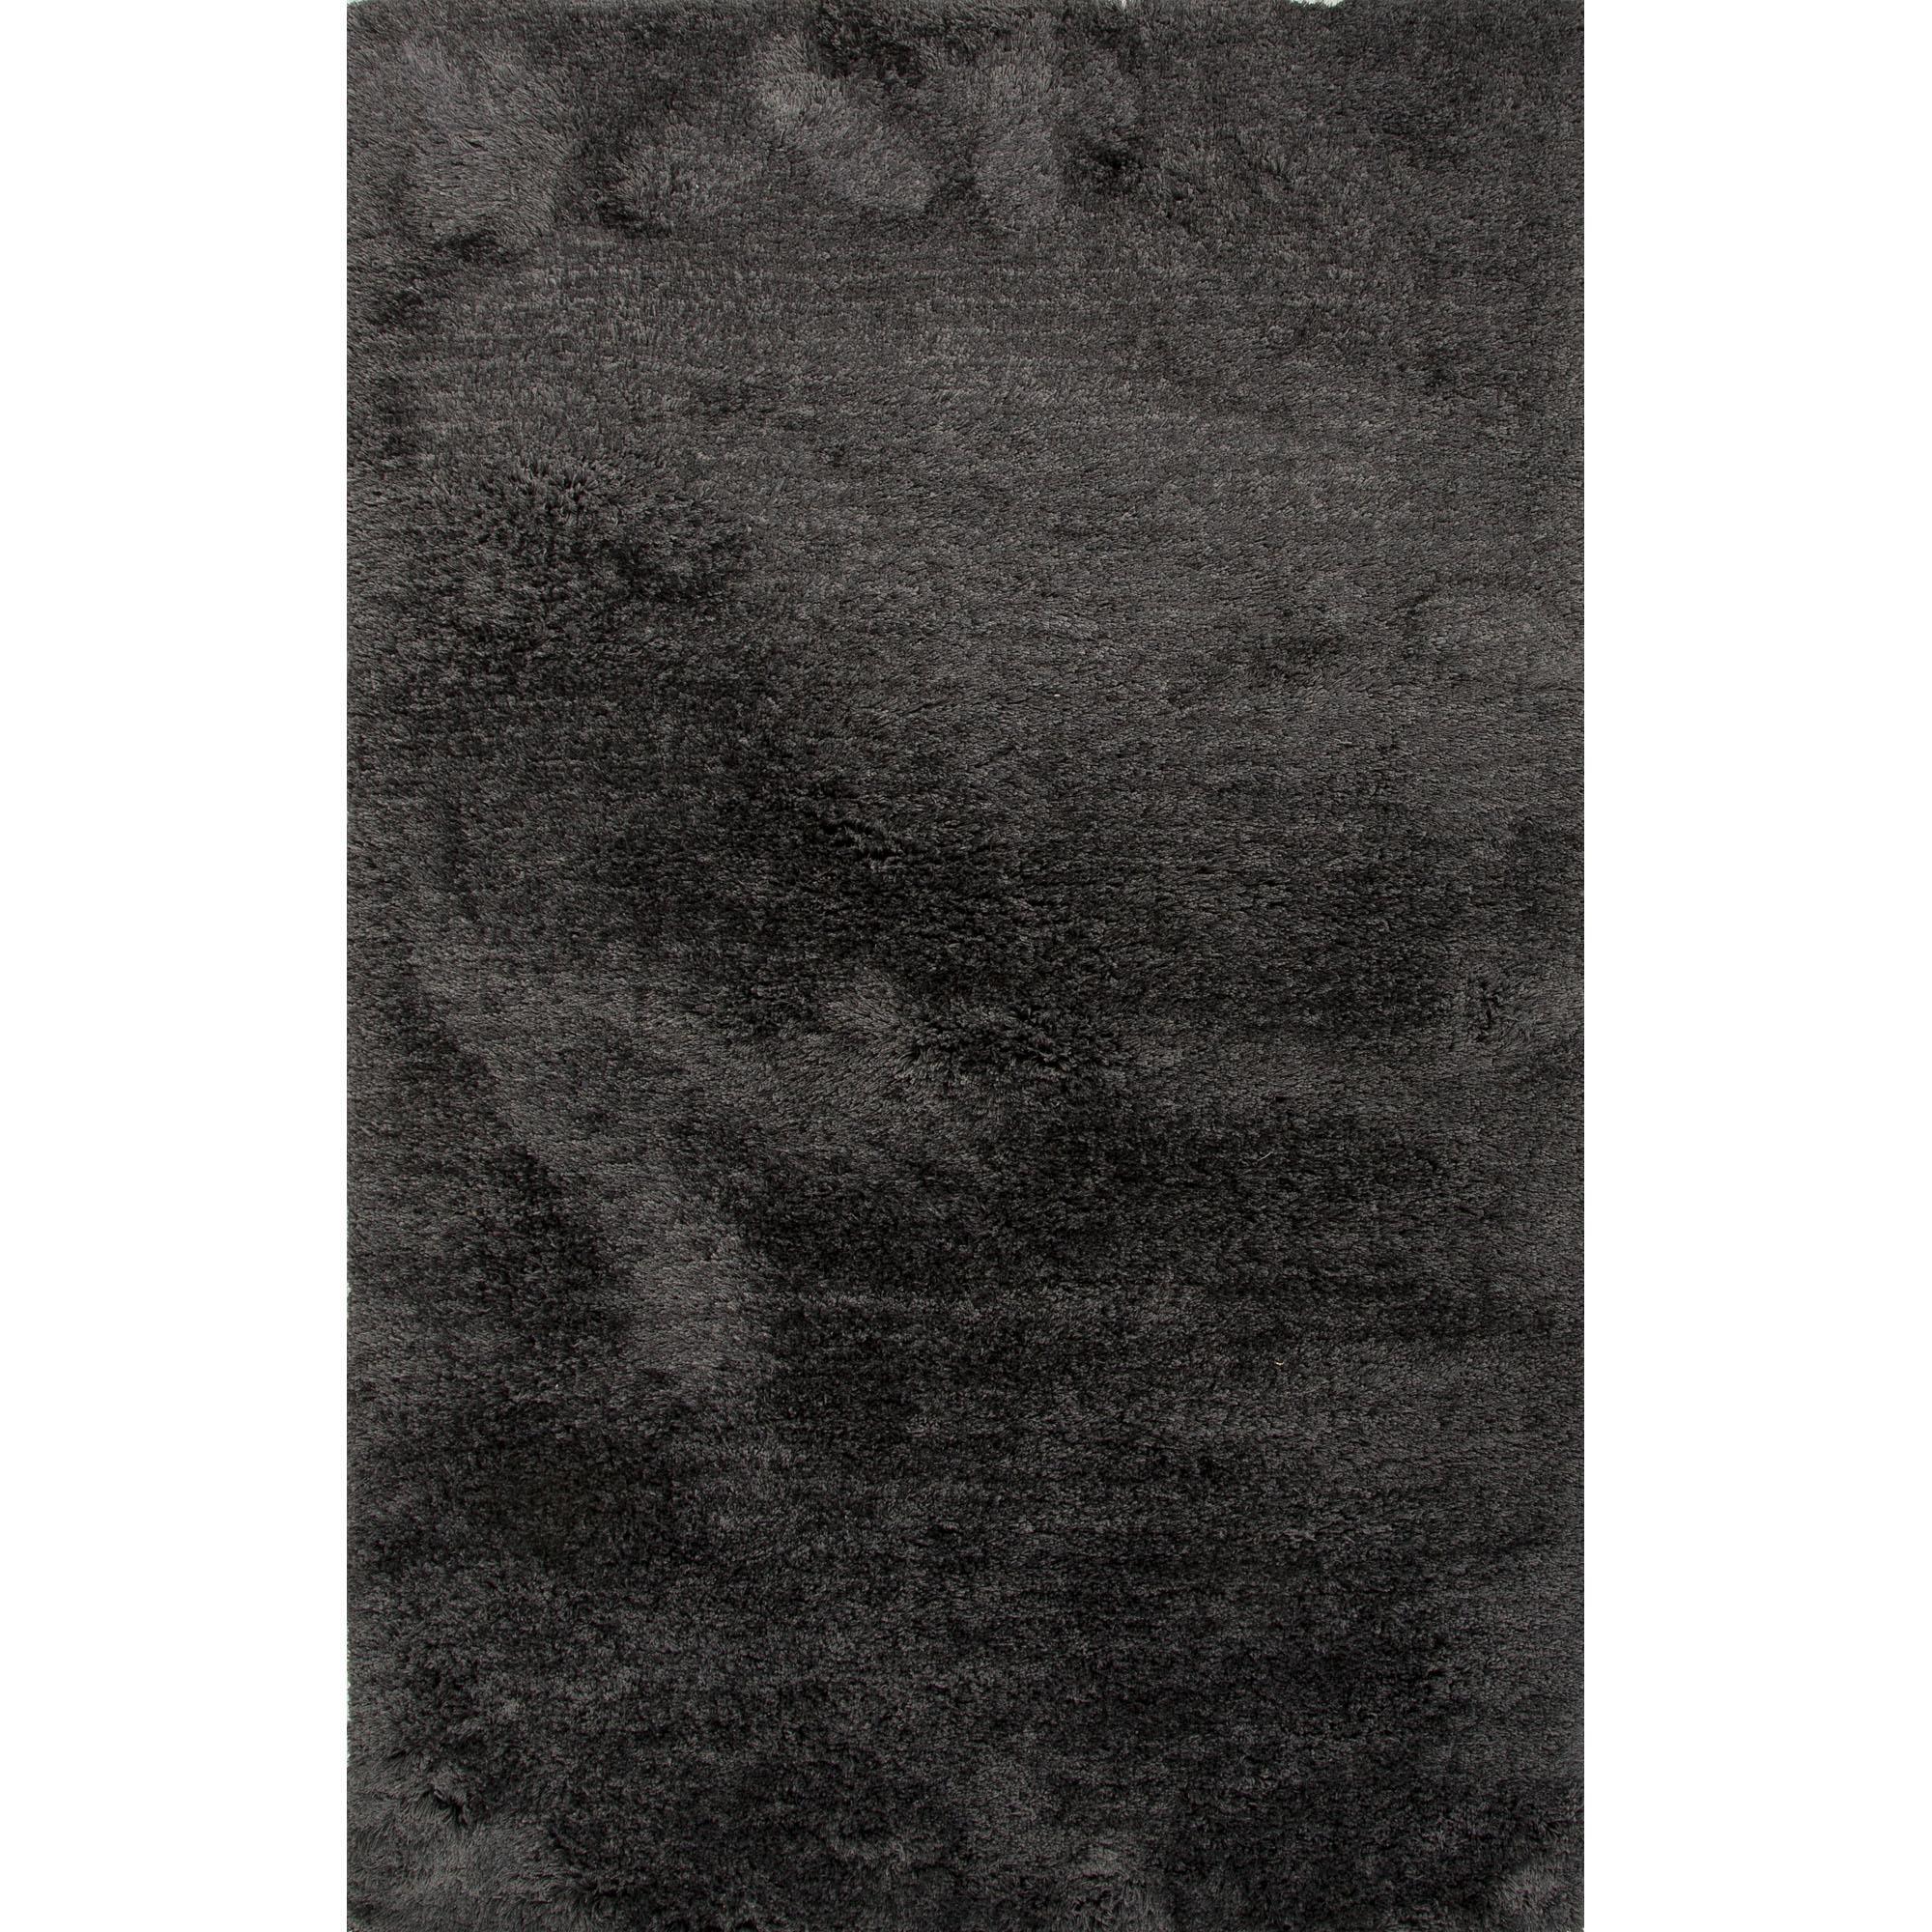 Angel 5 x 8 Rug by JAIPUR Rugs at Sprintz Furniture